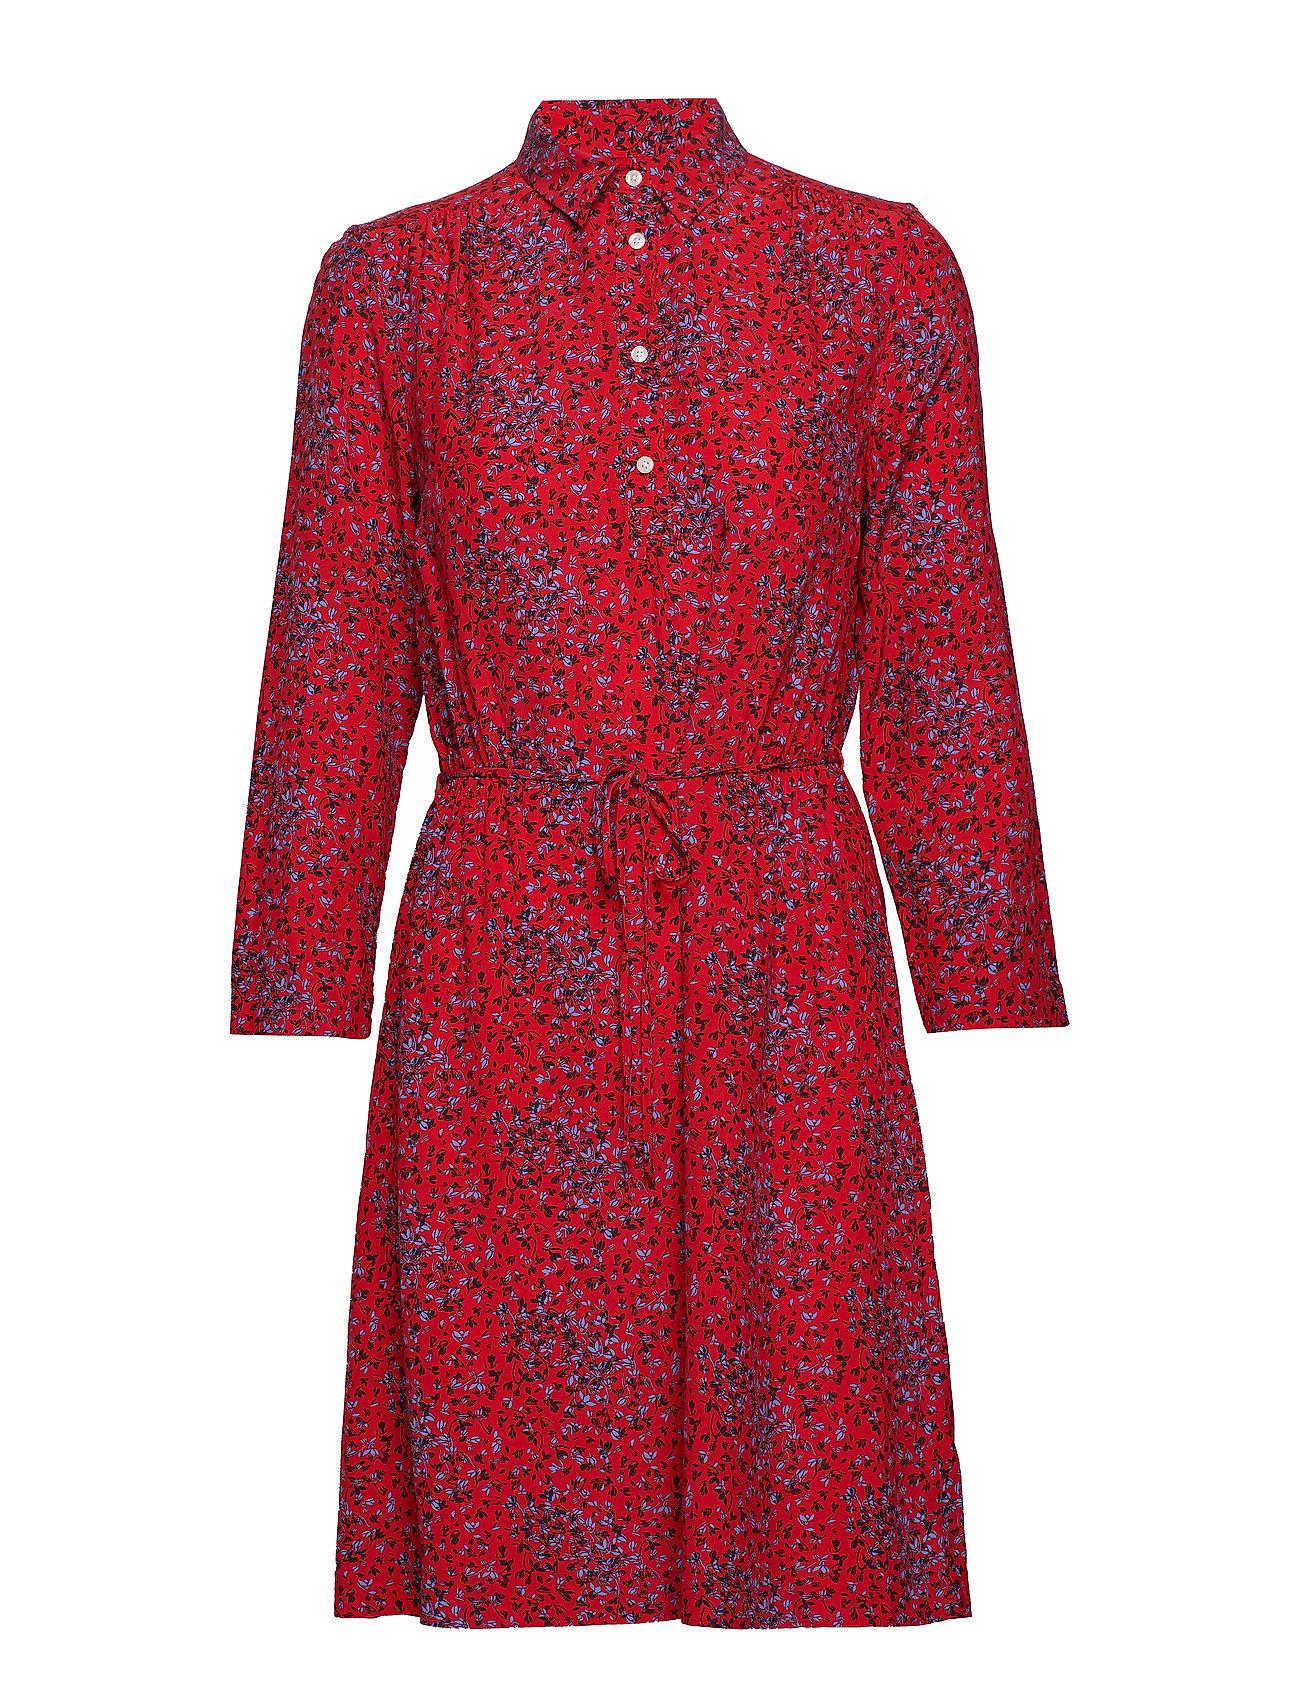 Gant O2. SNOWDROP SPREAD SHIRT DRESS - RED